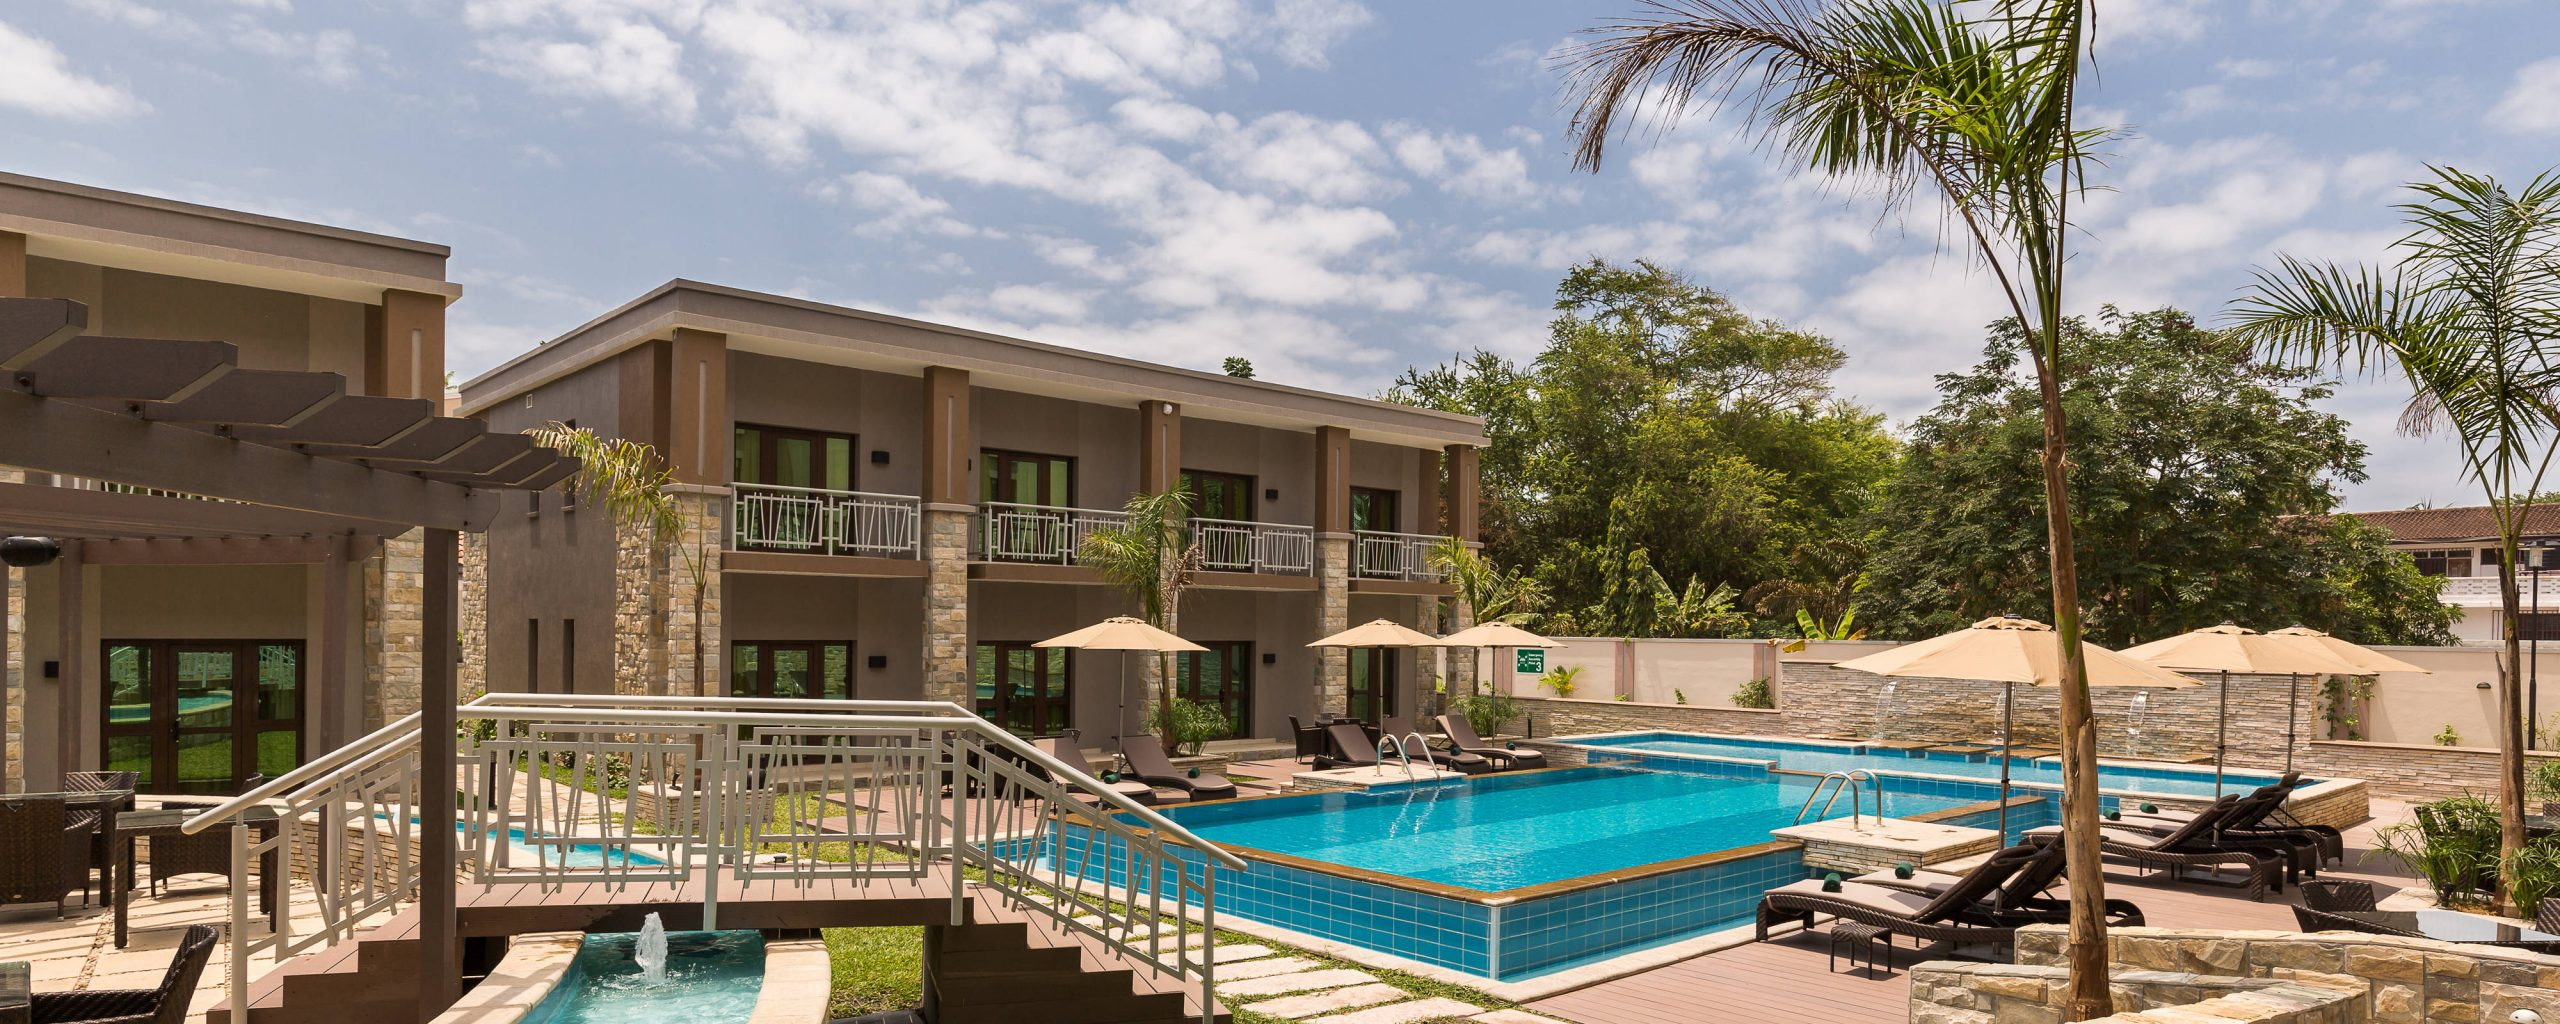 Protea Hotel Takoradi